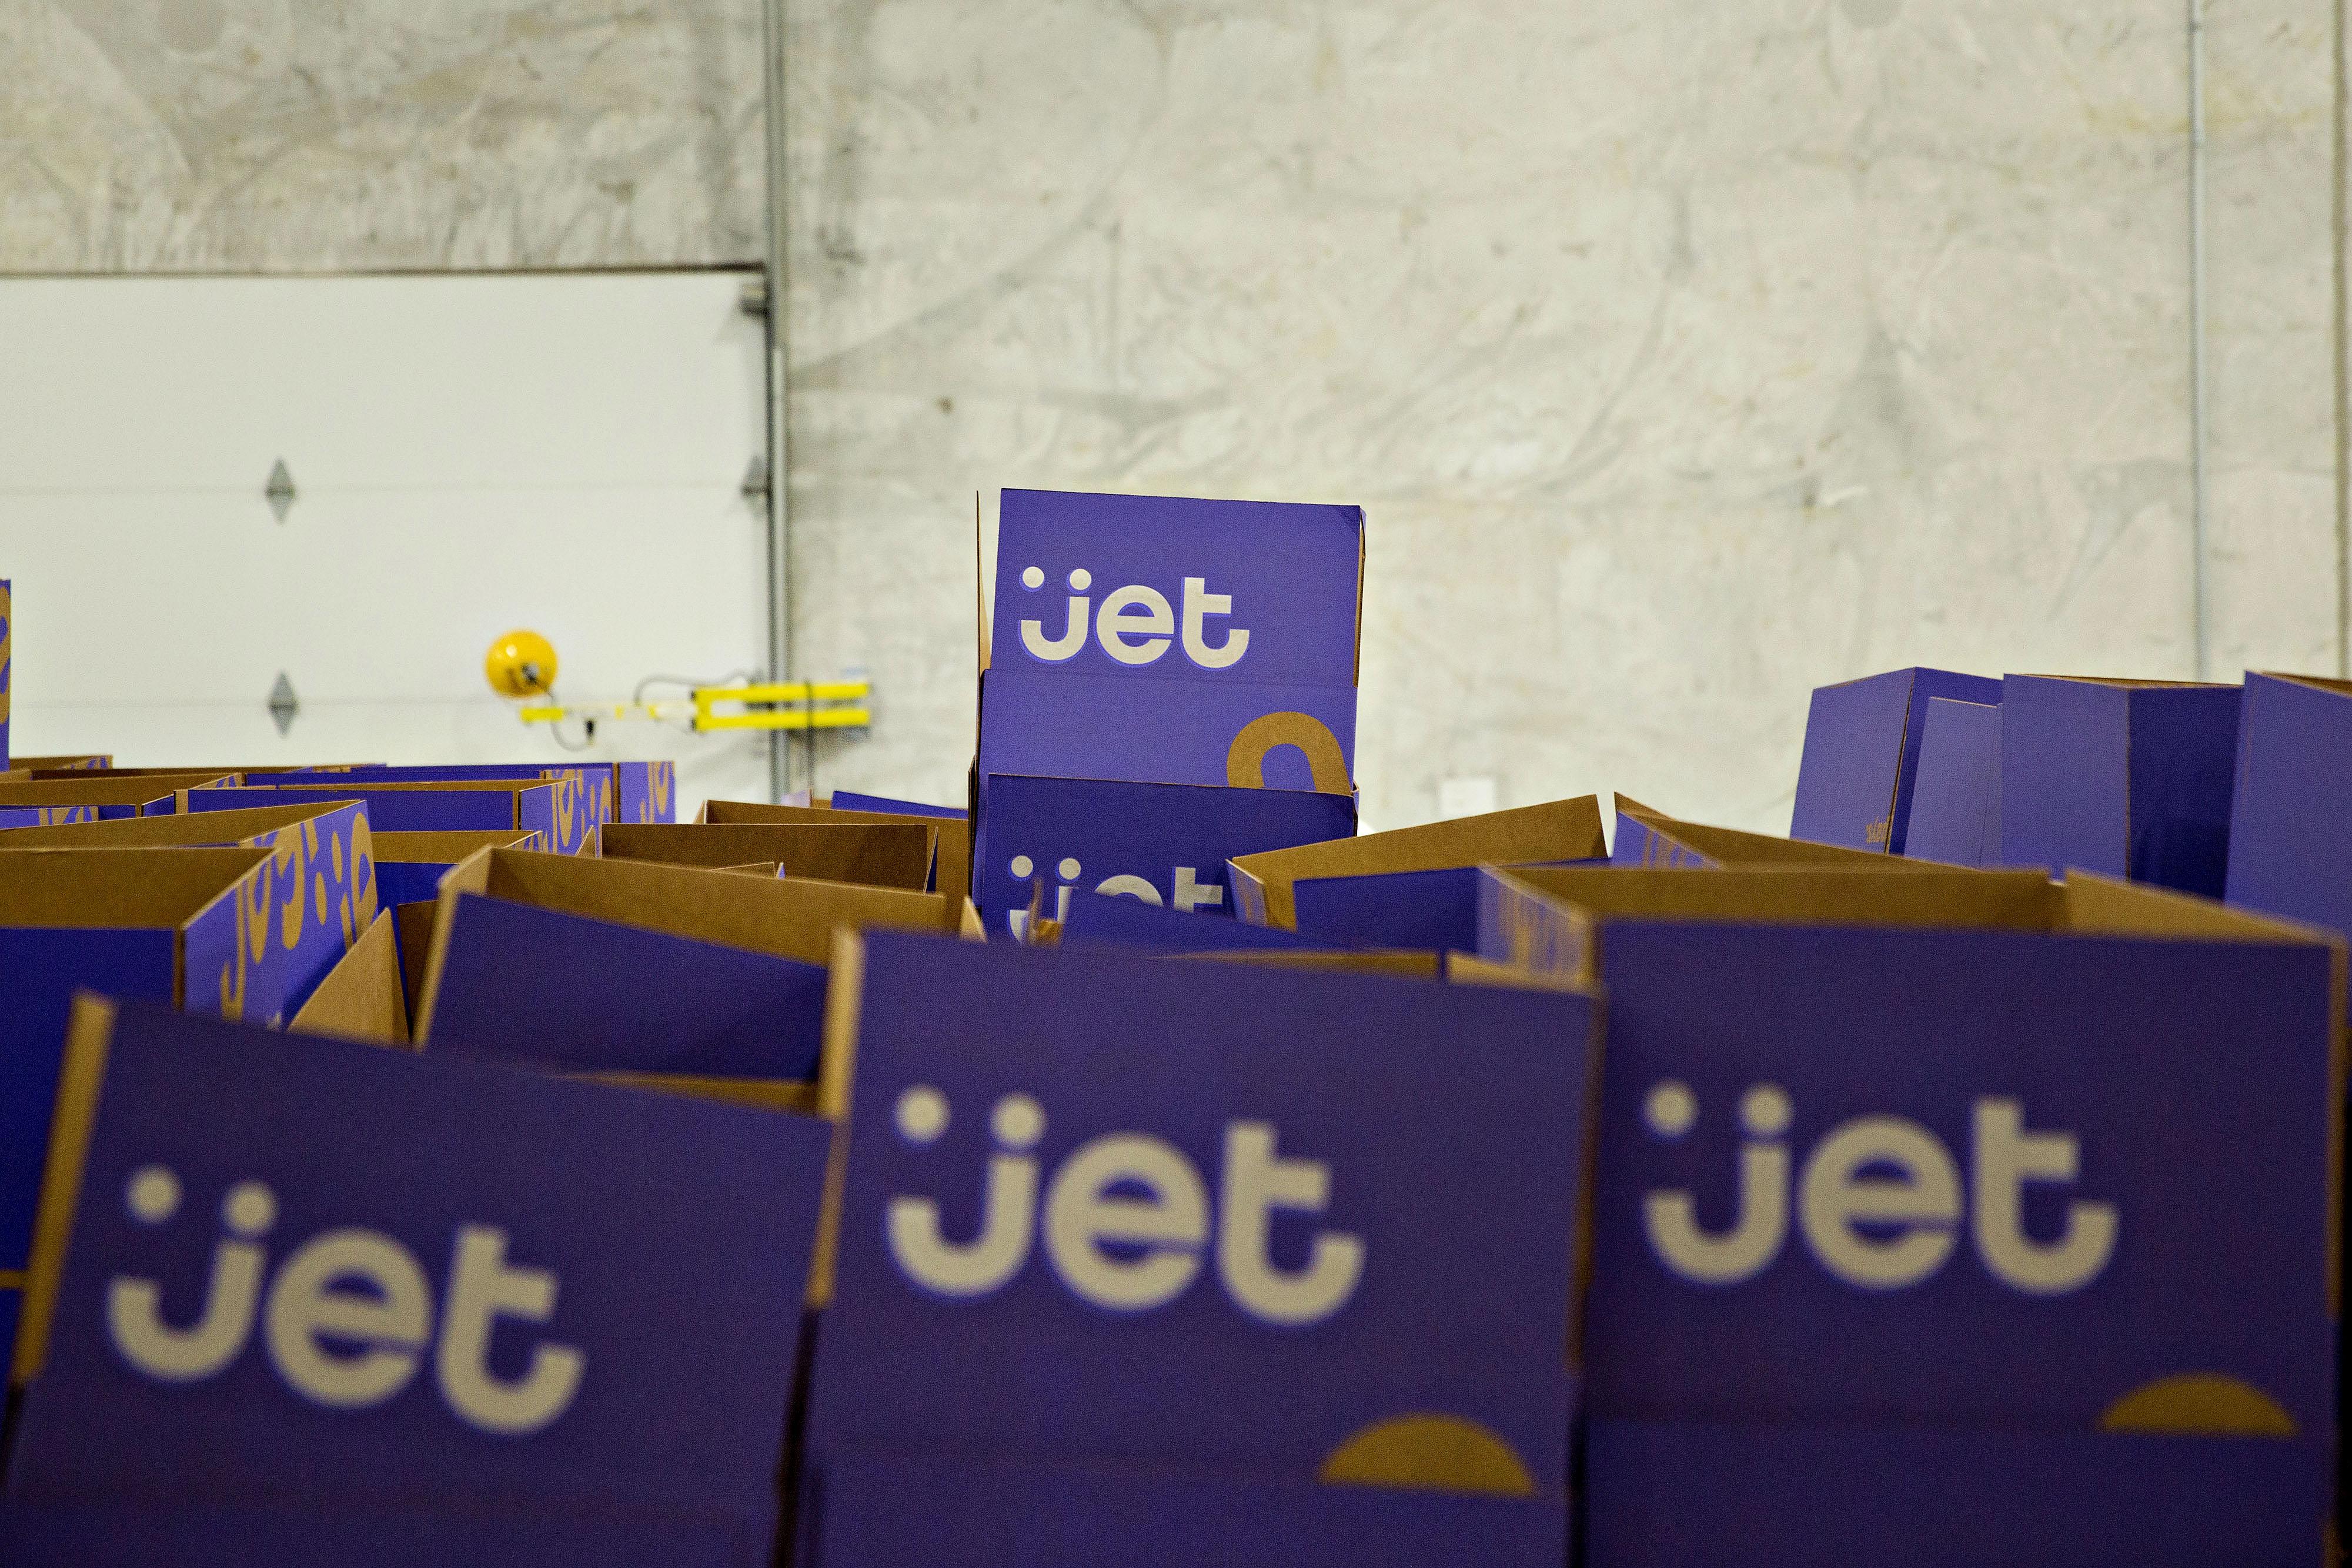 Inside A Jet.com Inc. Fulfillment Center On Cyber Monday